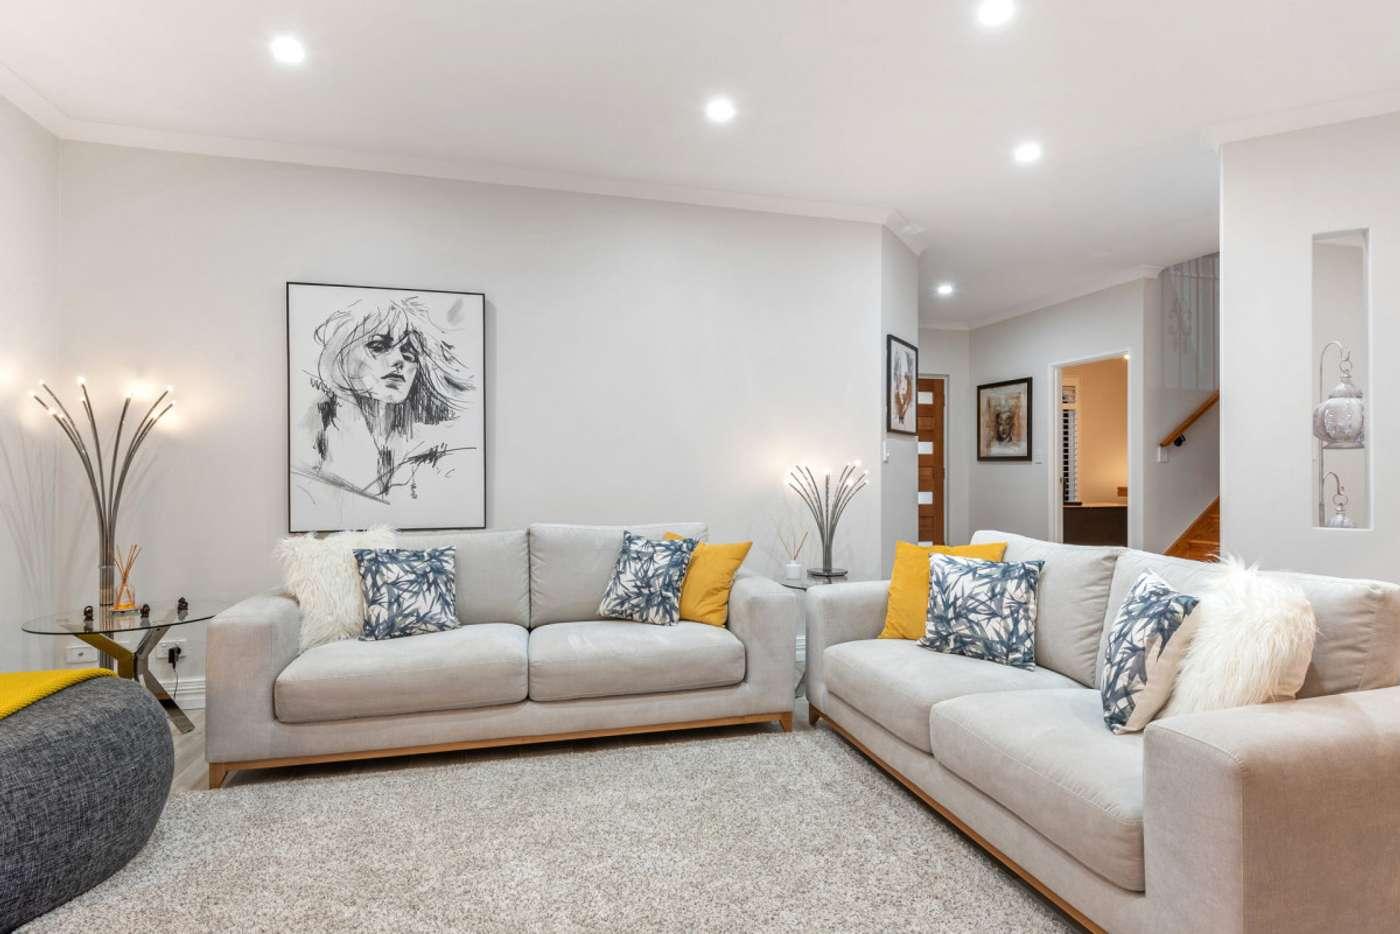 Sixth view of Homely house listing, 7 Cherub Way, Currambine WA 6028